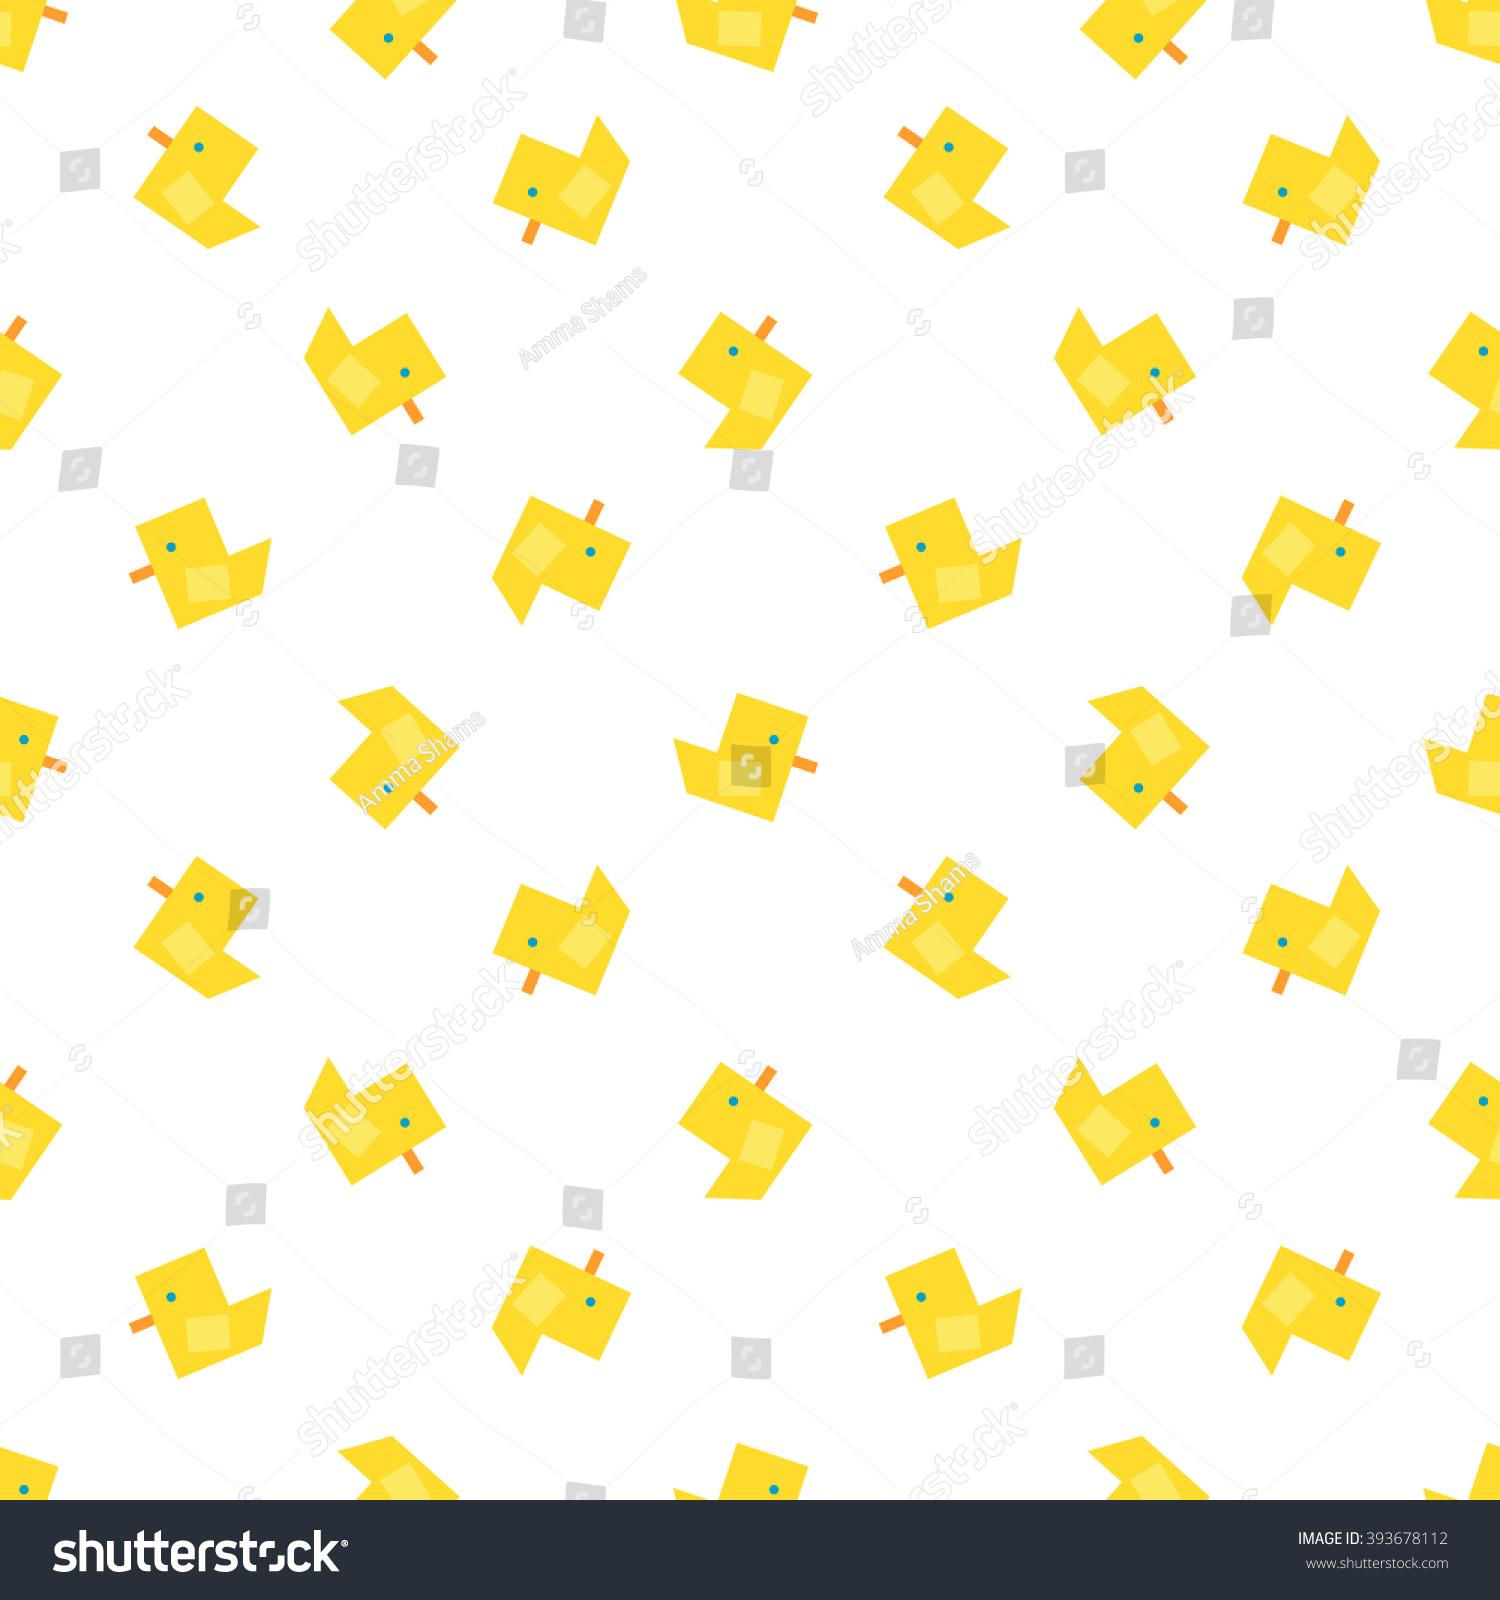 Cute Ducks Vector Seamless Pattern Baby Stock Vector ...